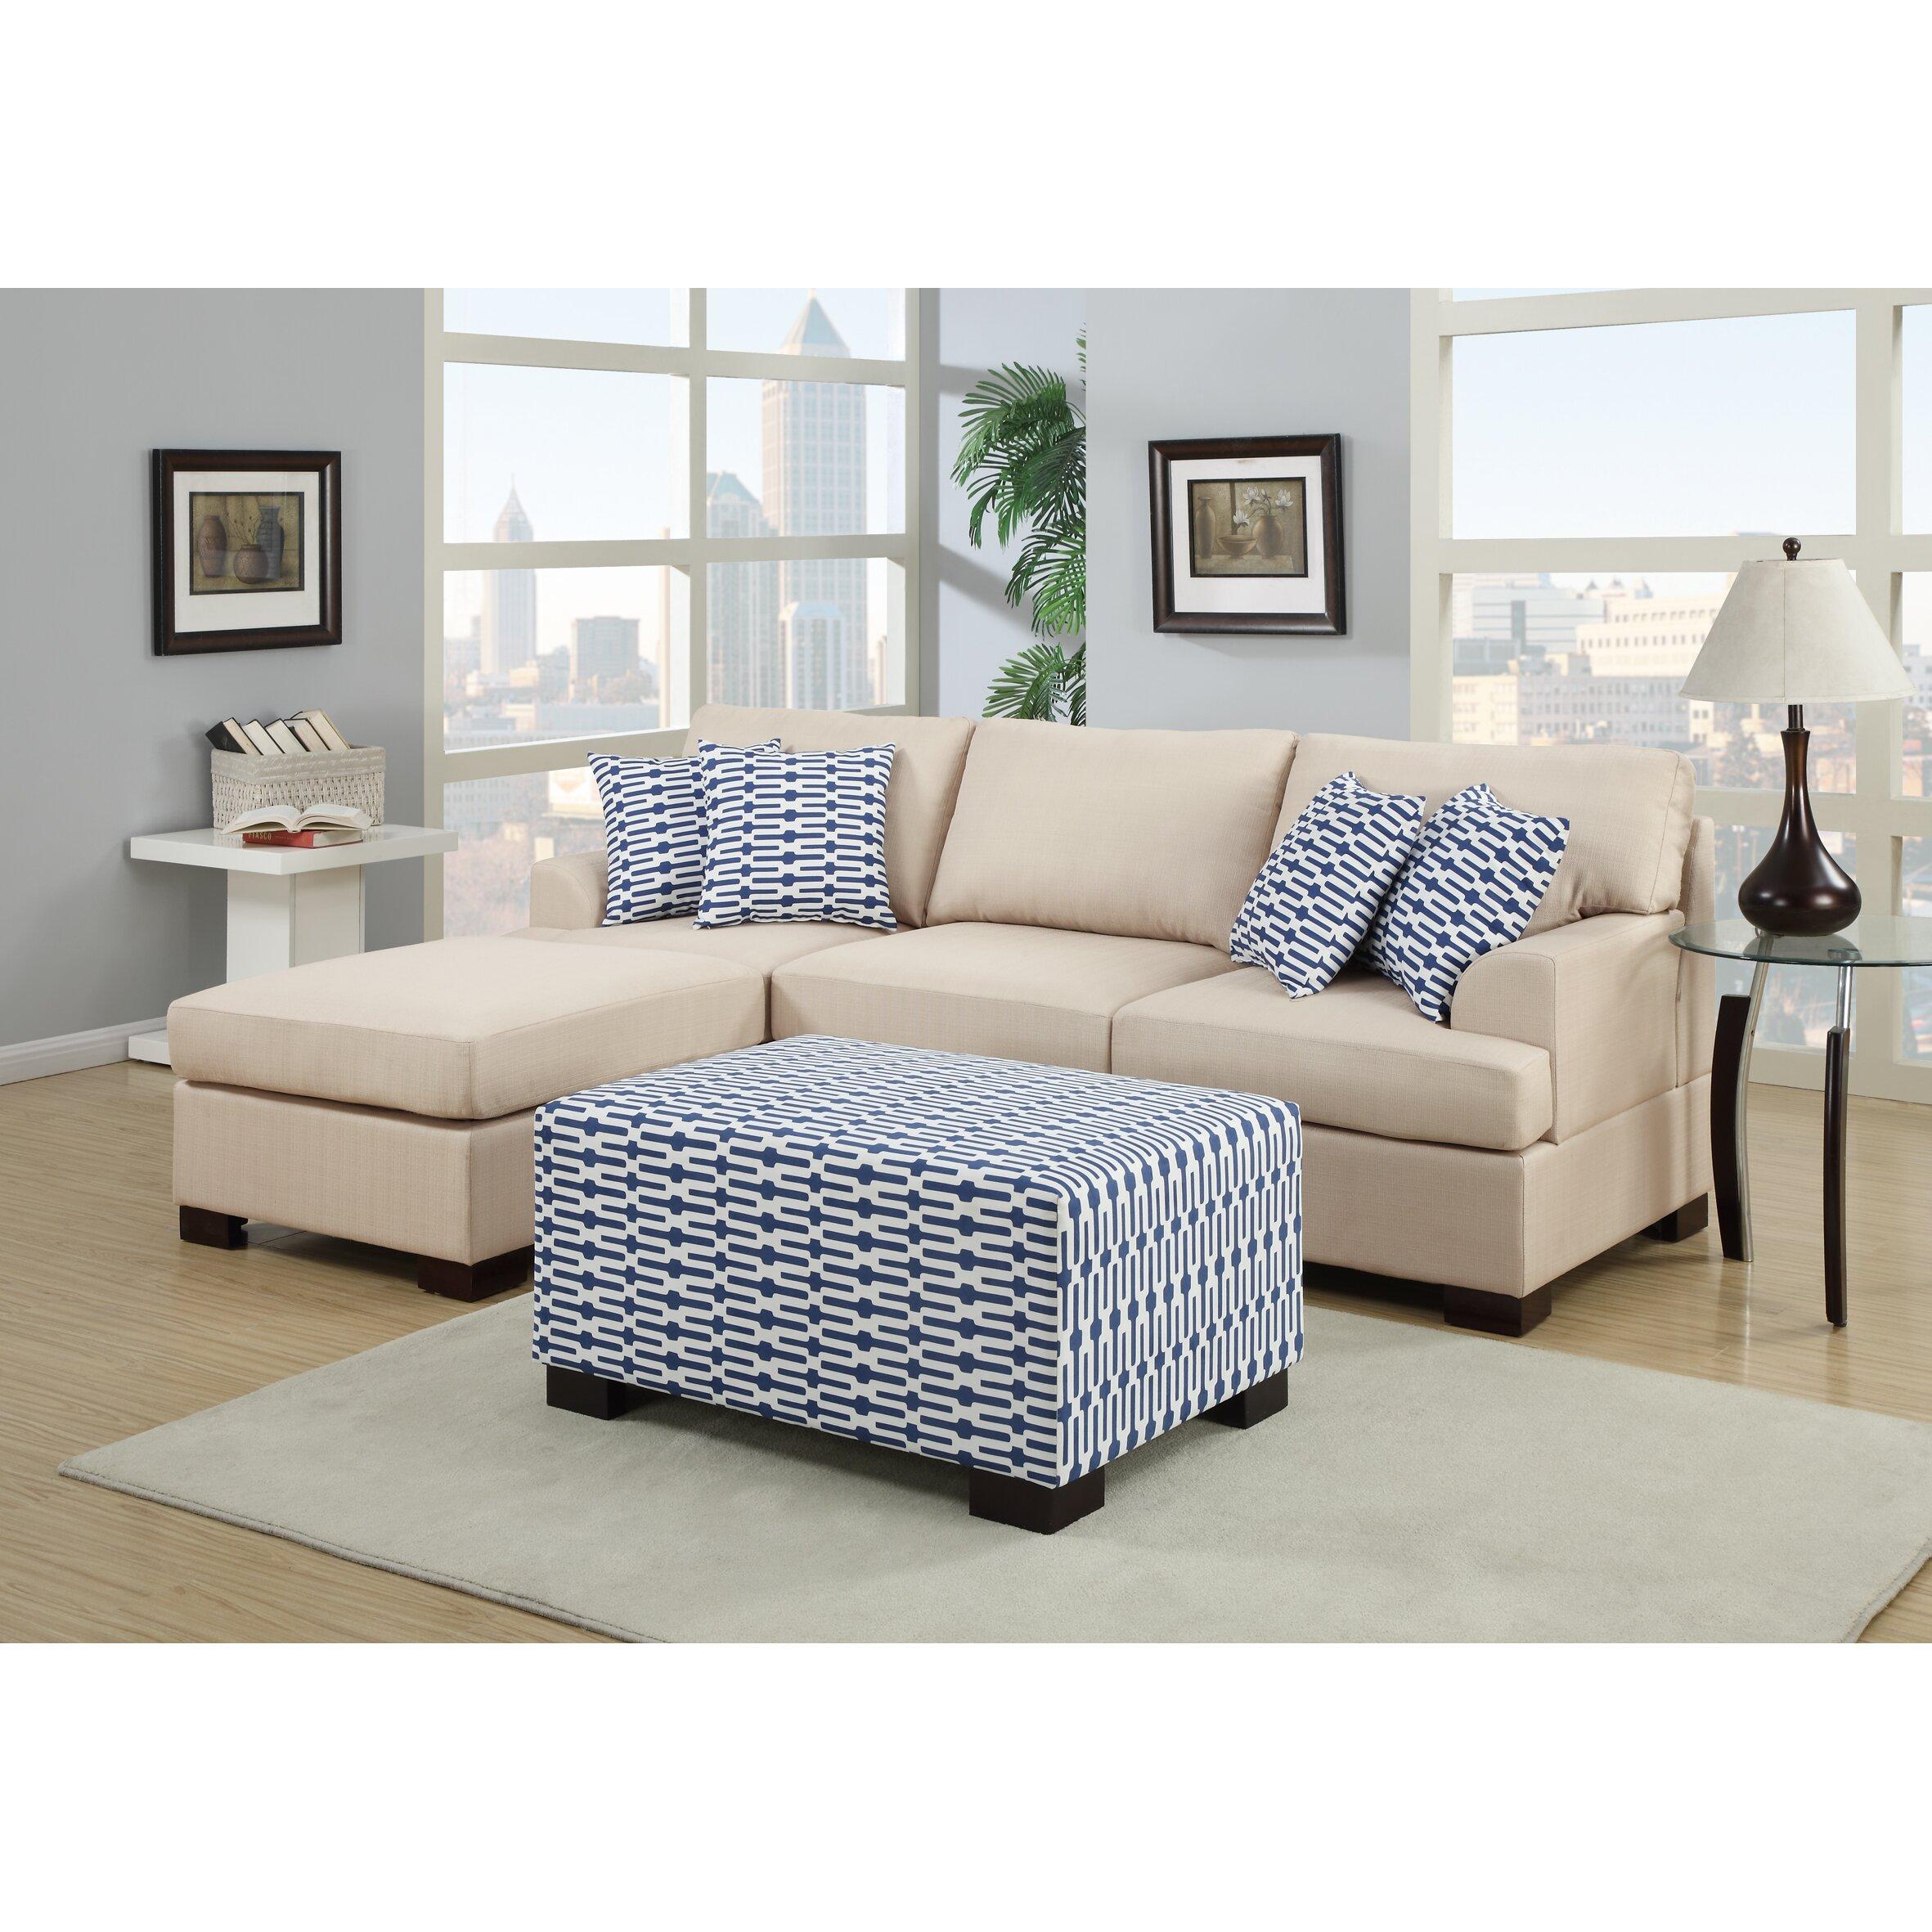 Poundex Sectional White Leather Sofa Chaise: Poundex Bobkona Roman Reversible Chaise Sectional